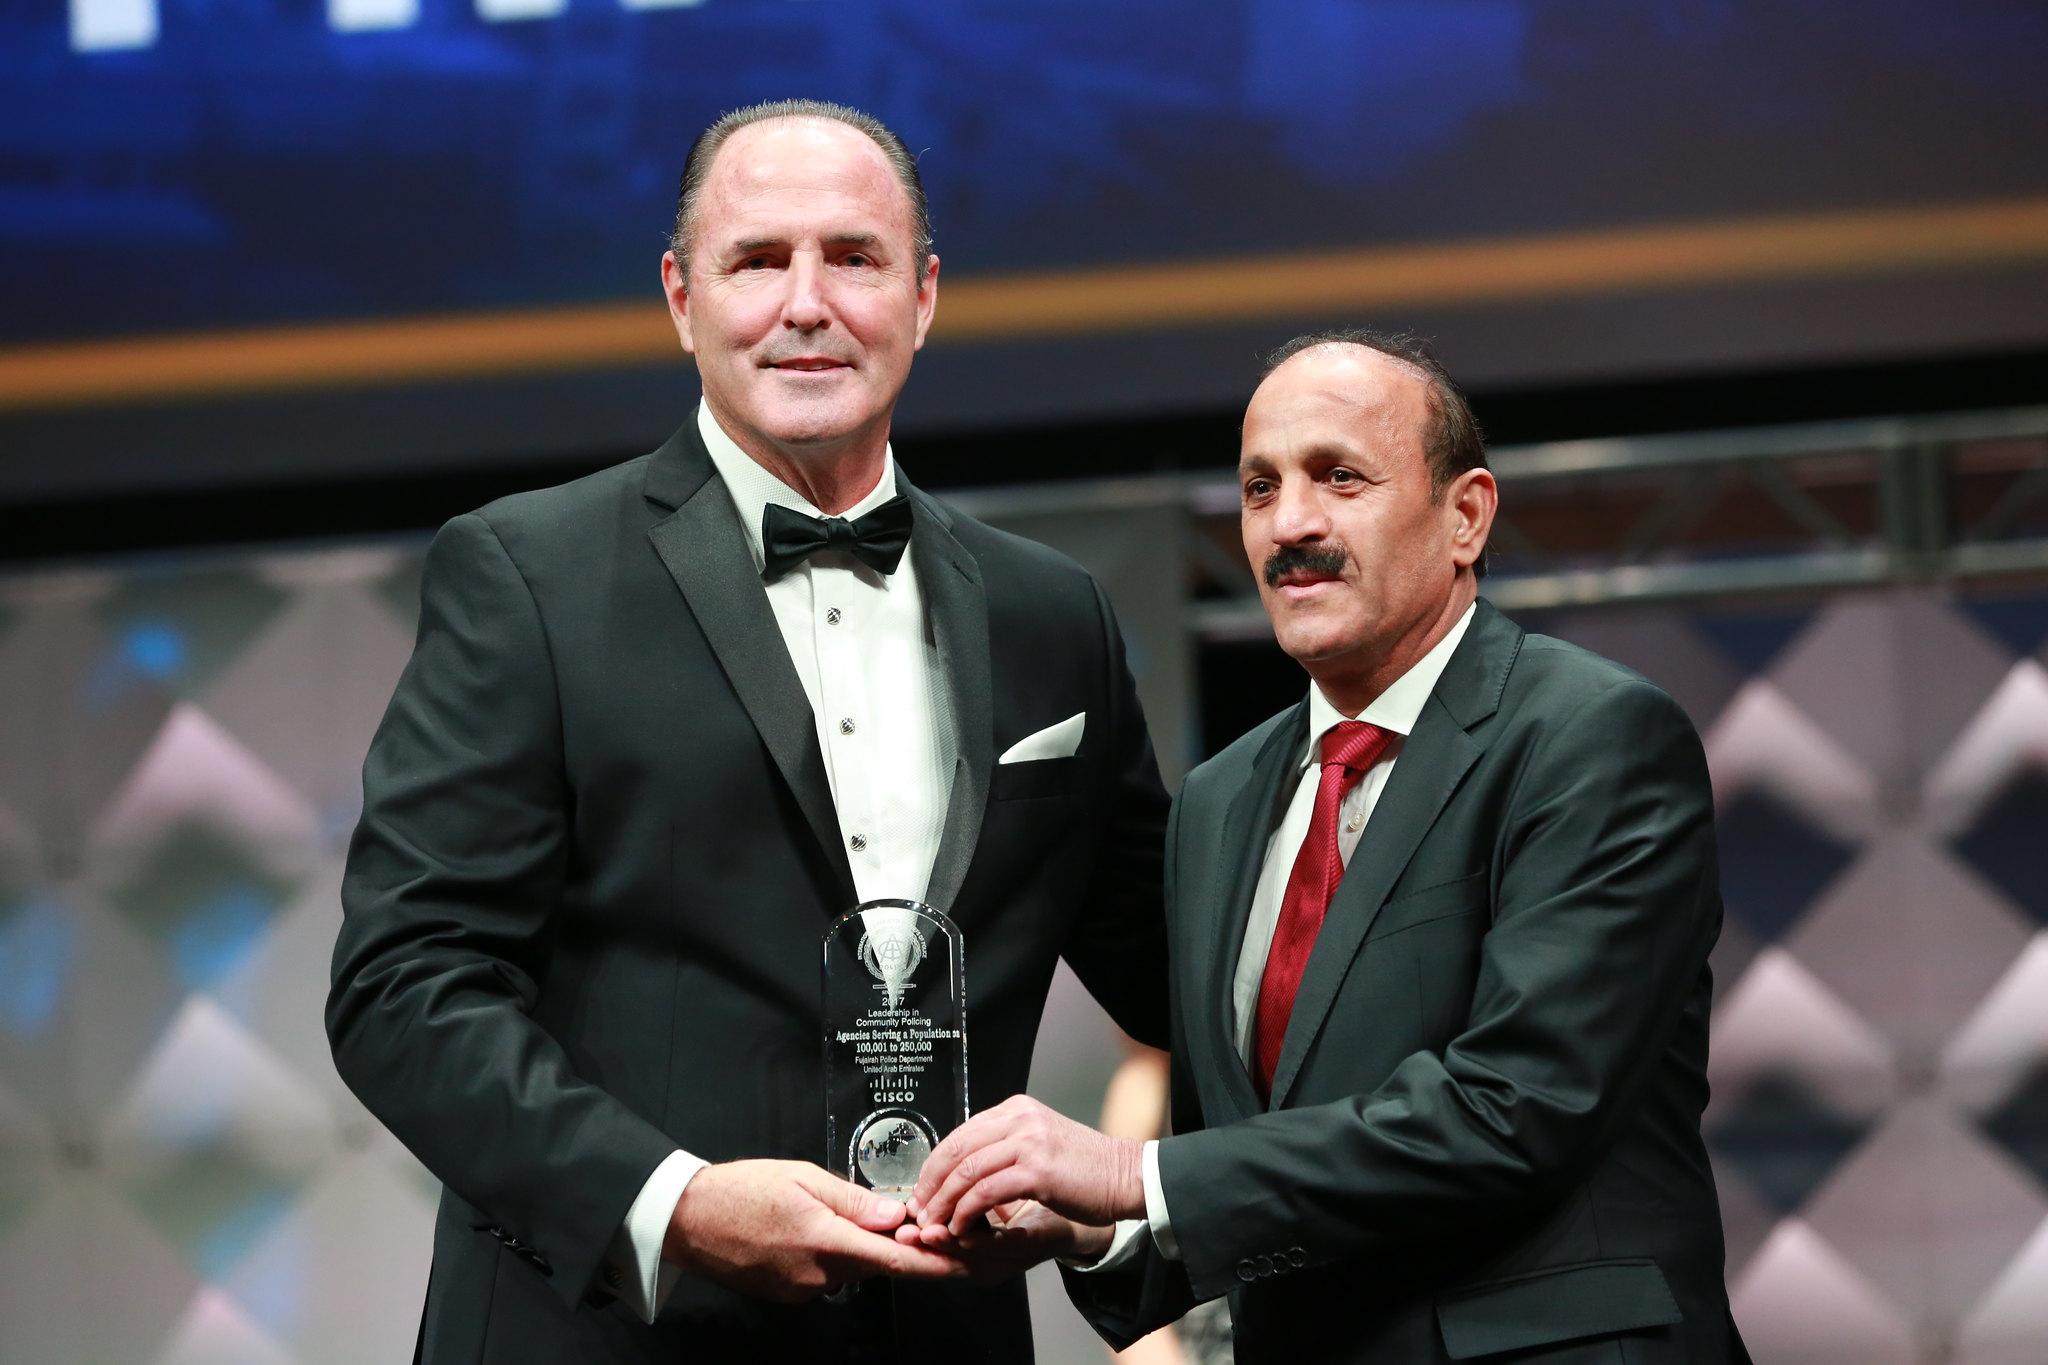 IACPCisco Leadership in Community Policing Award (100K-250K) - Fujairah